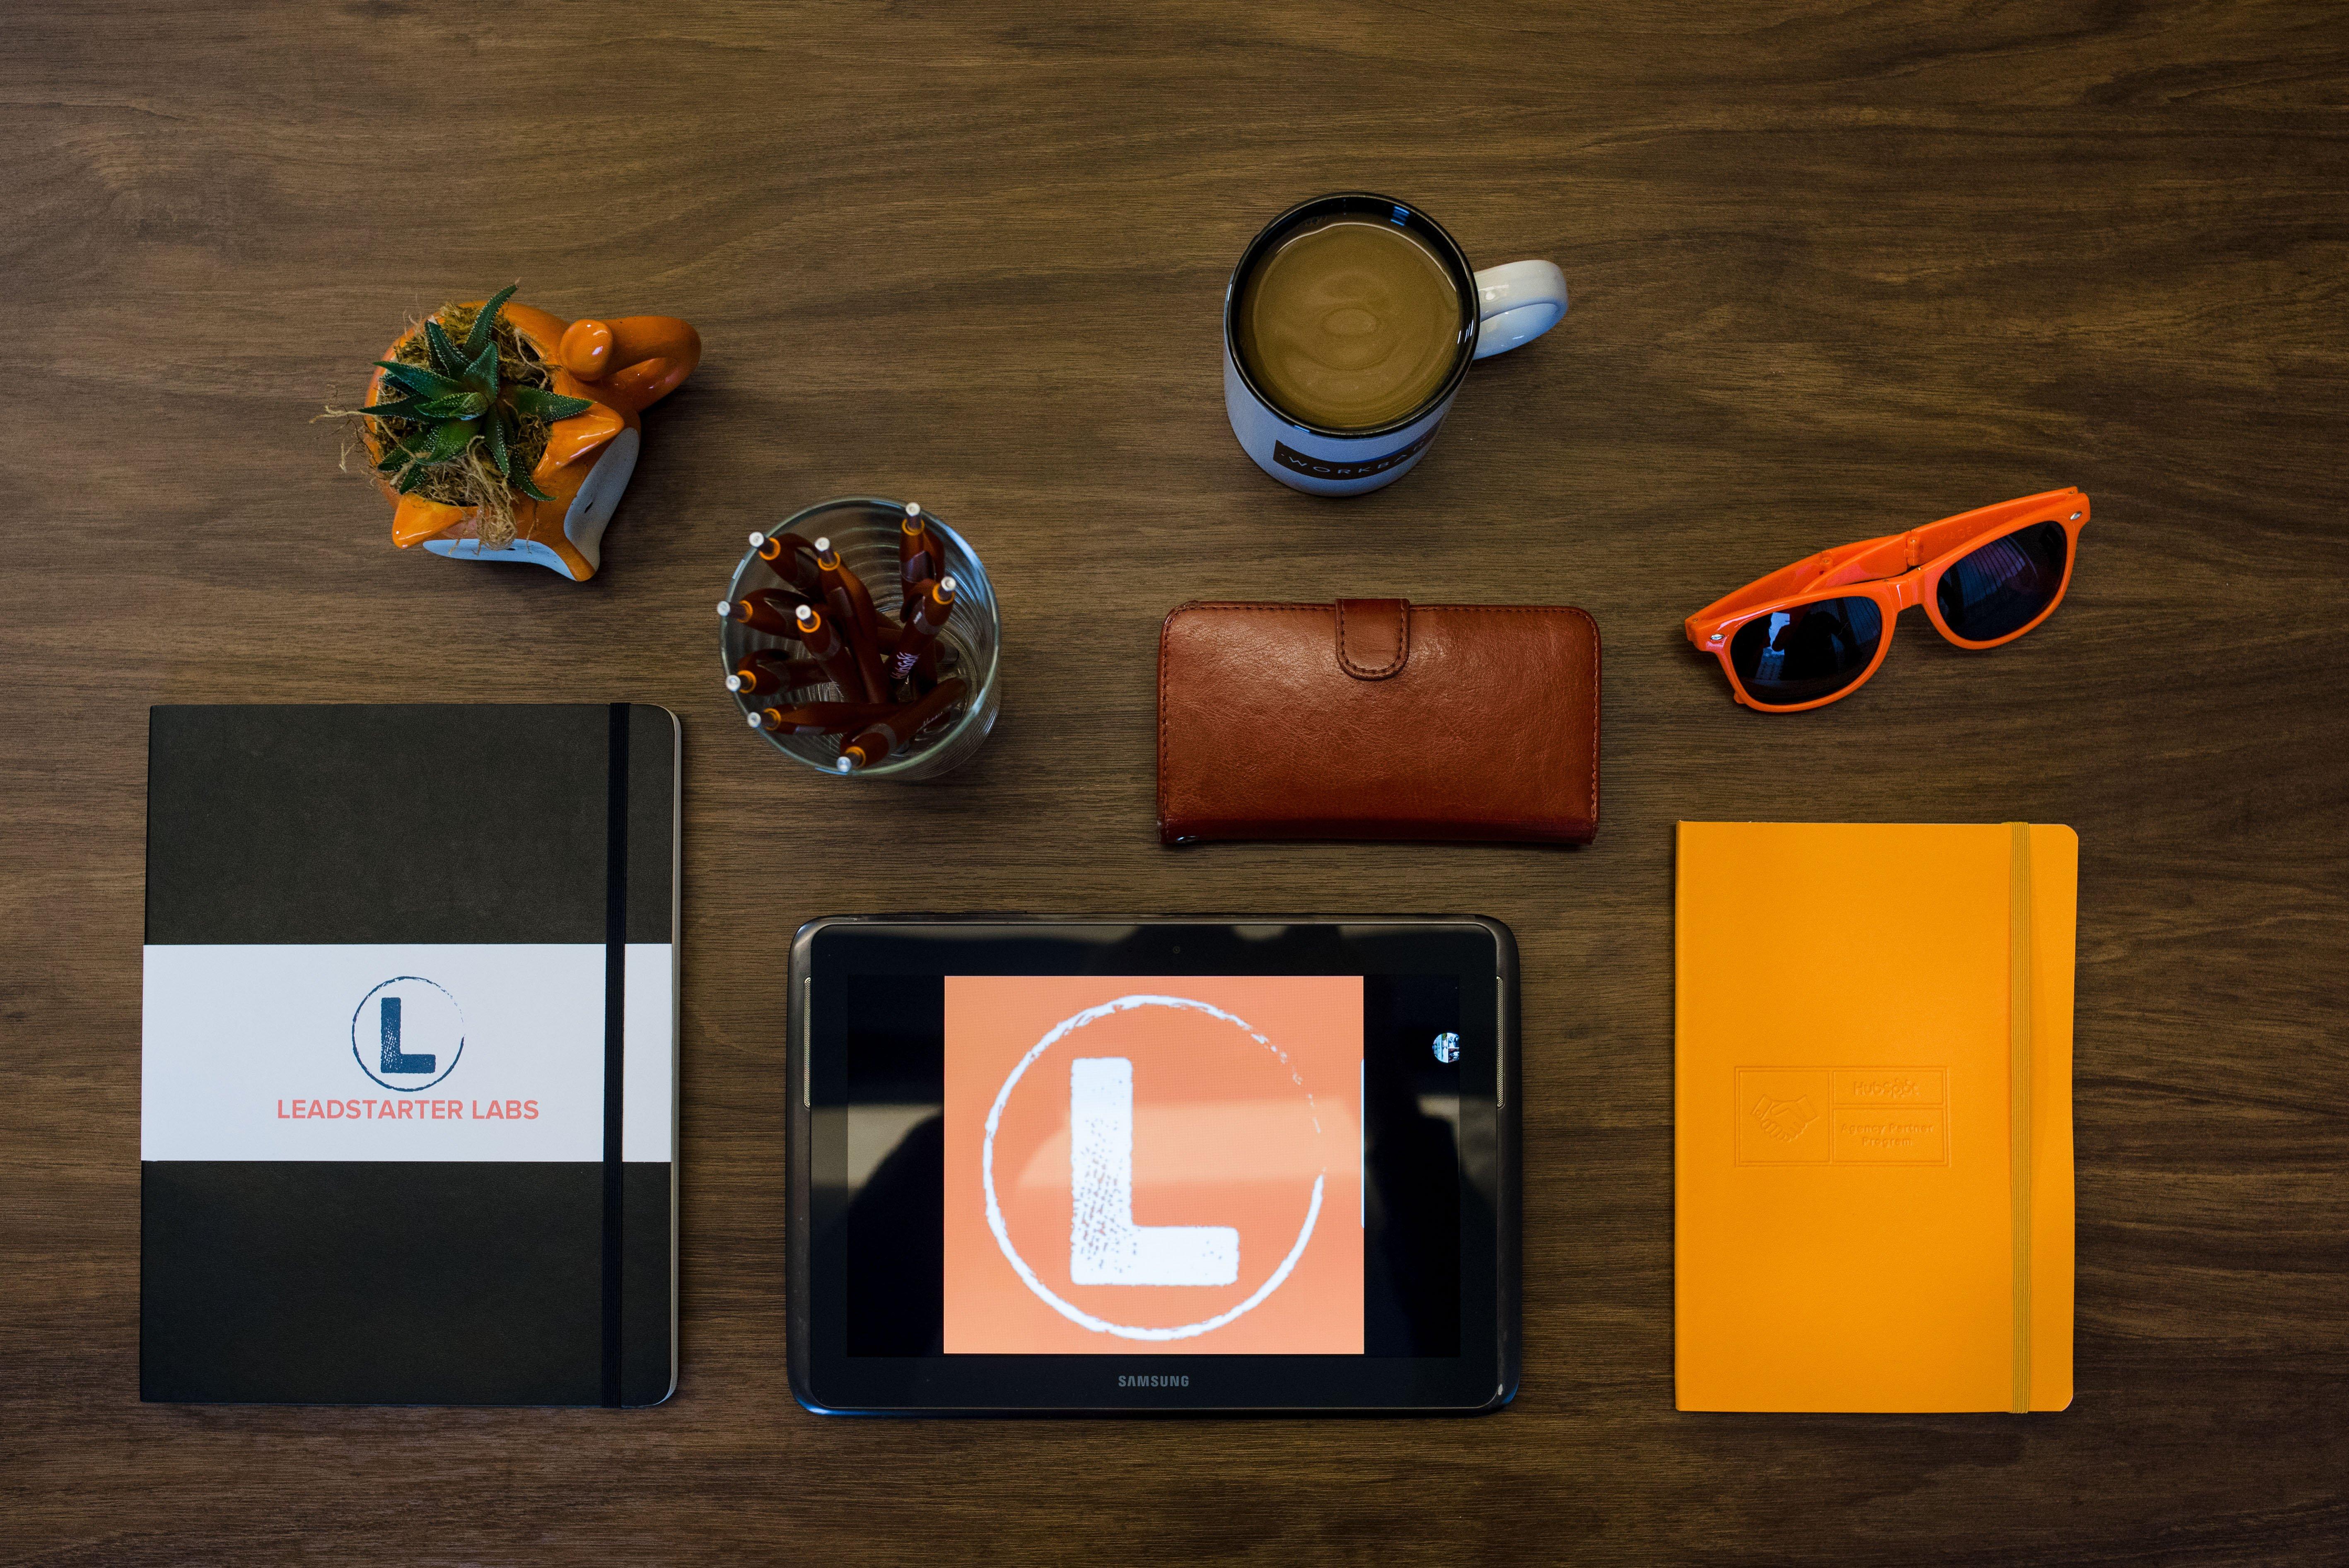 Leadstarter Labs